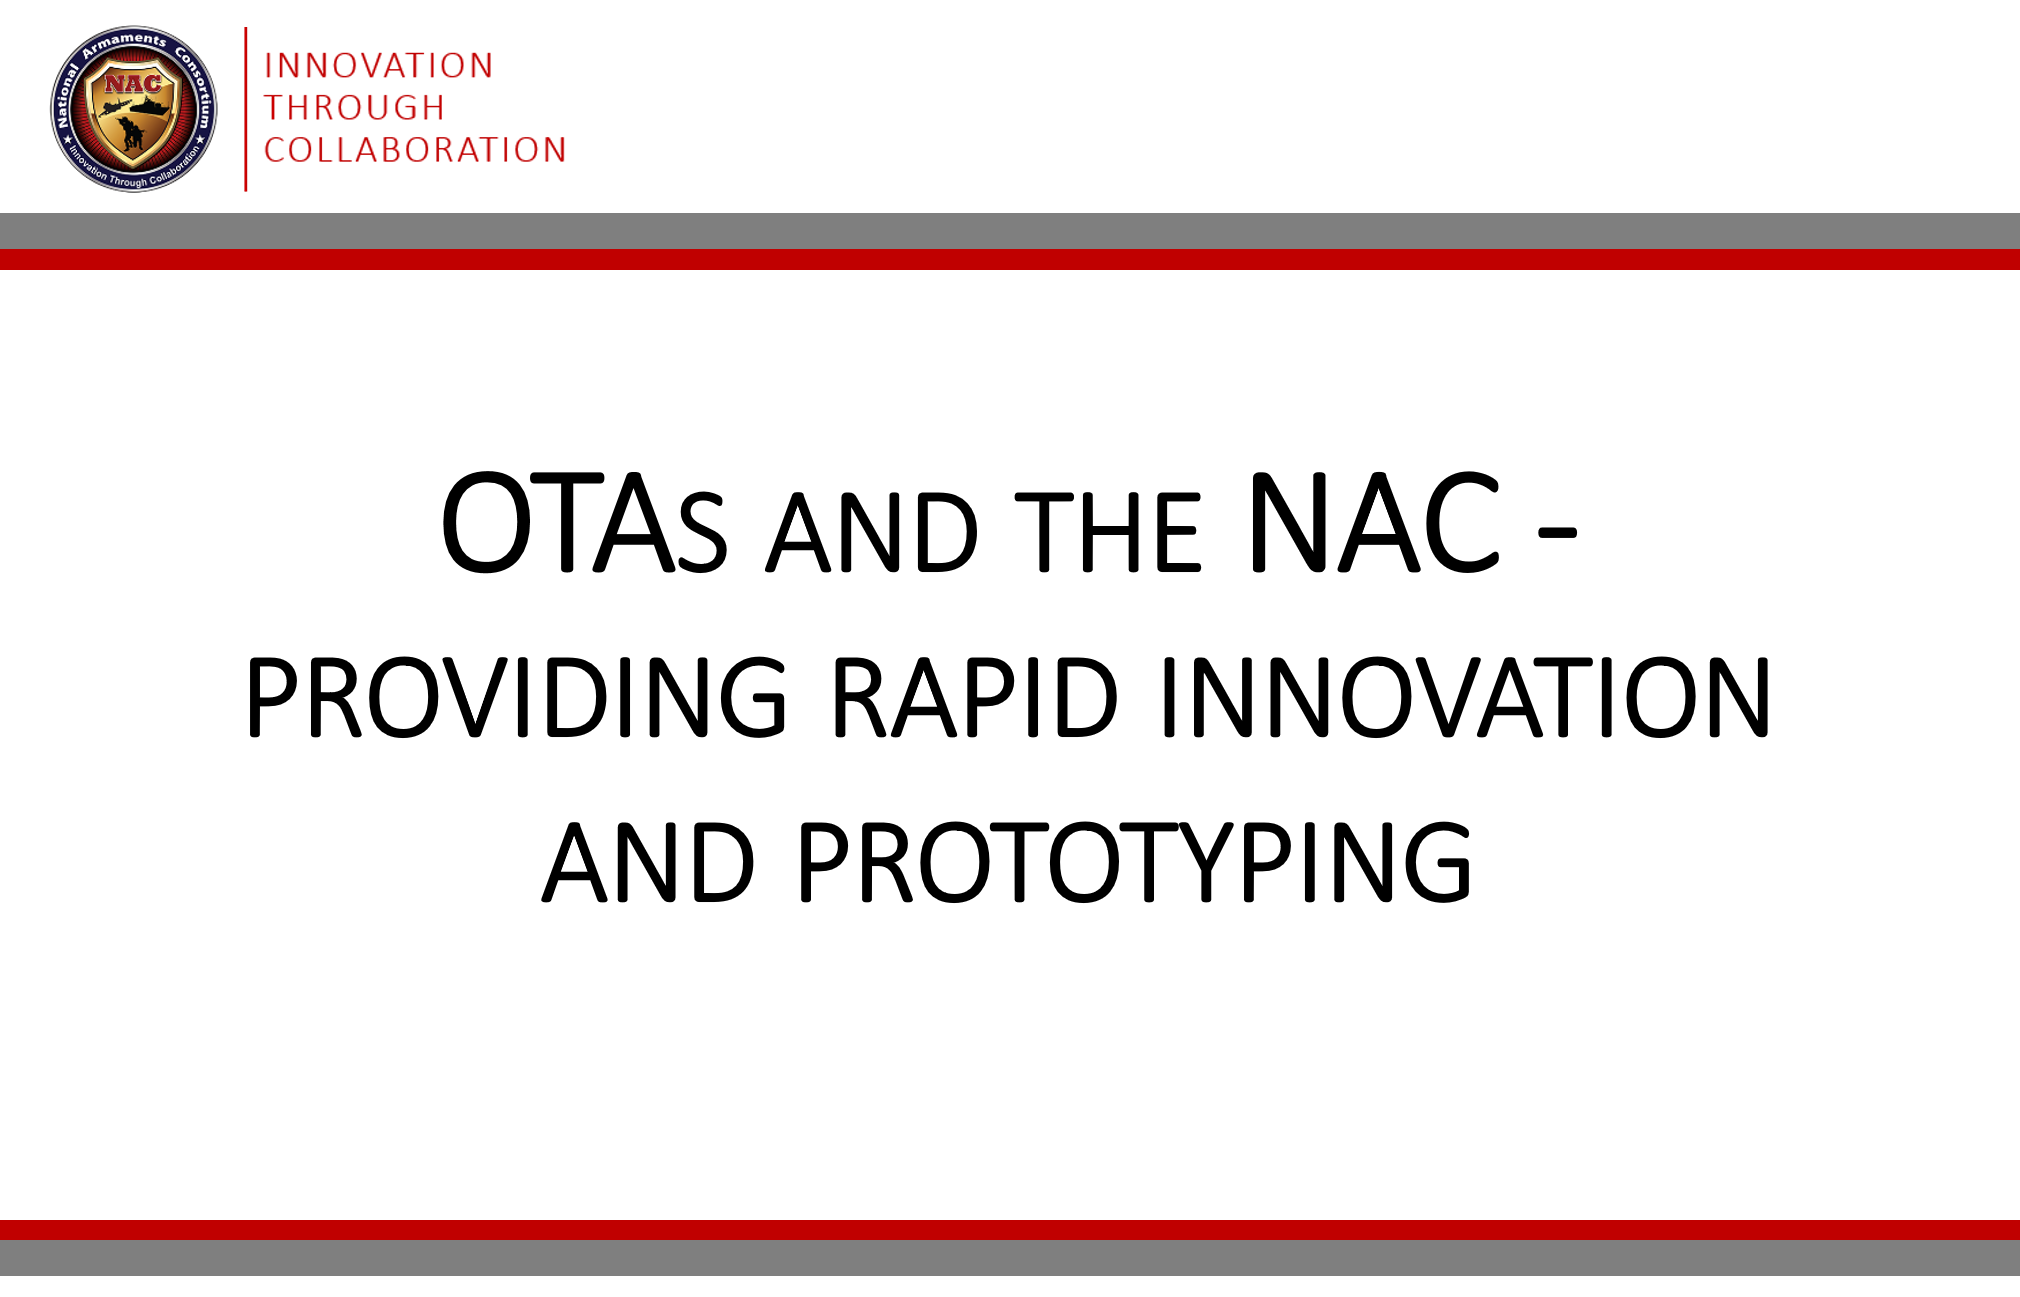 NAC: OTAs and the NAC: Providing Rapid Innovation and Prototyping